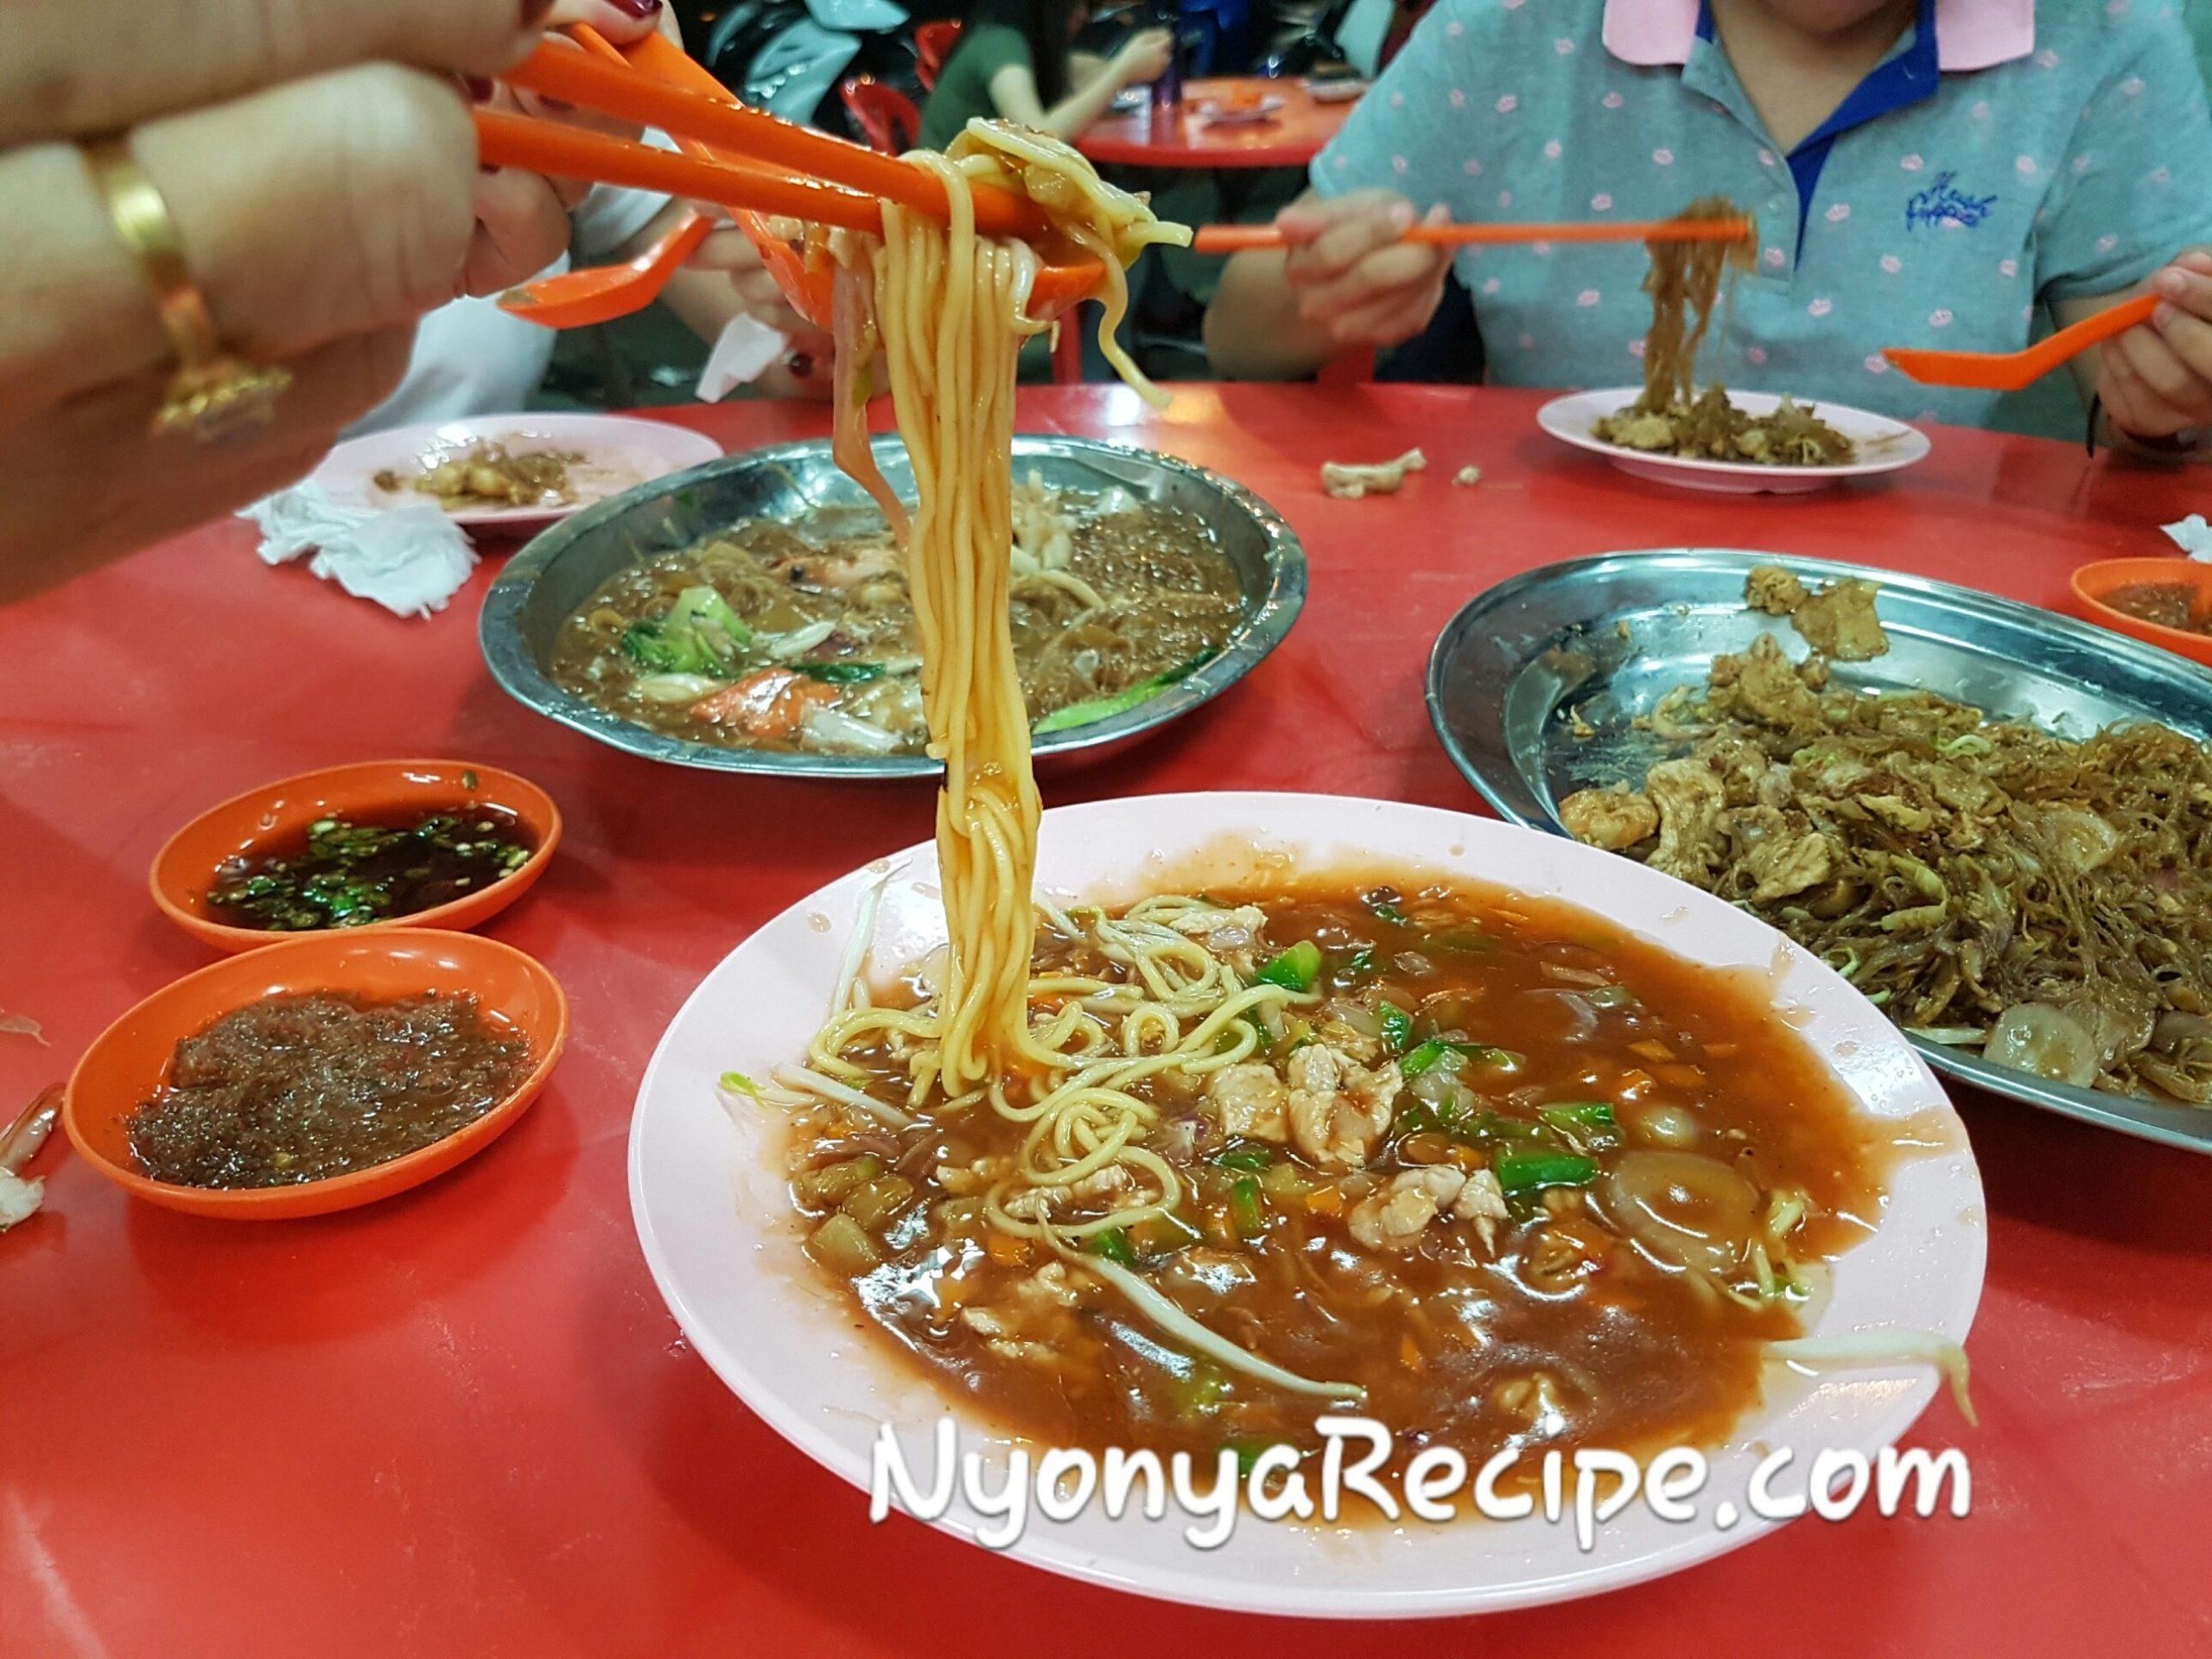 noodles, # Penang, #Malaysian, #cheap food, #Goodfood, #Foodporn